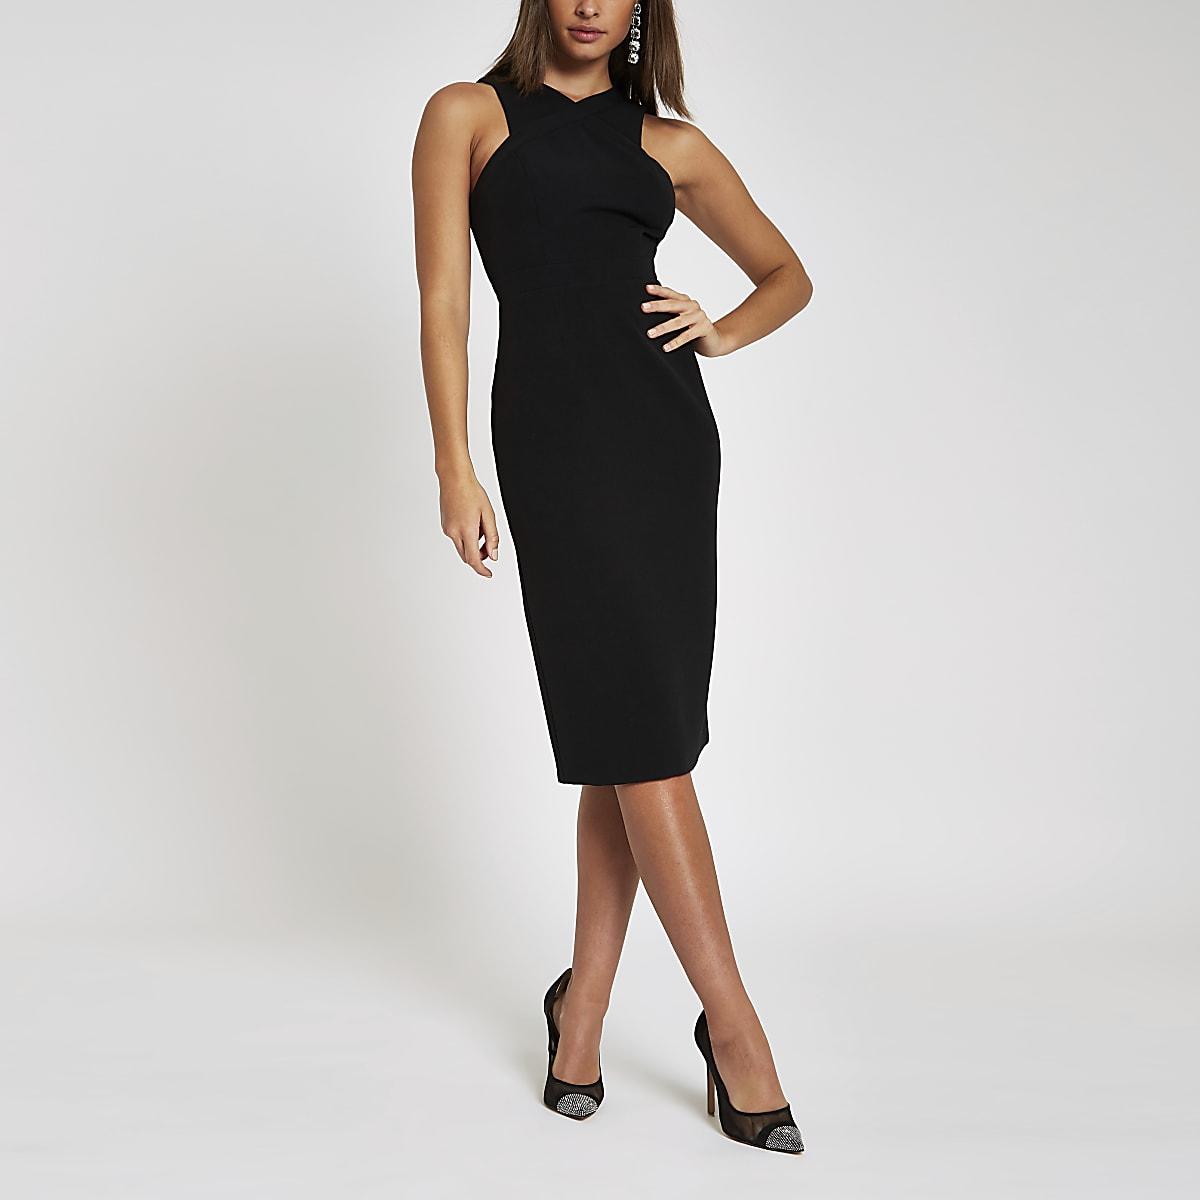 Black cross high neck bodycon midi dress